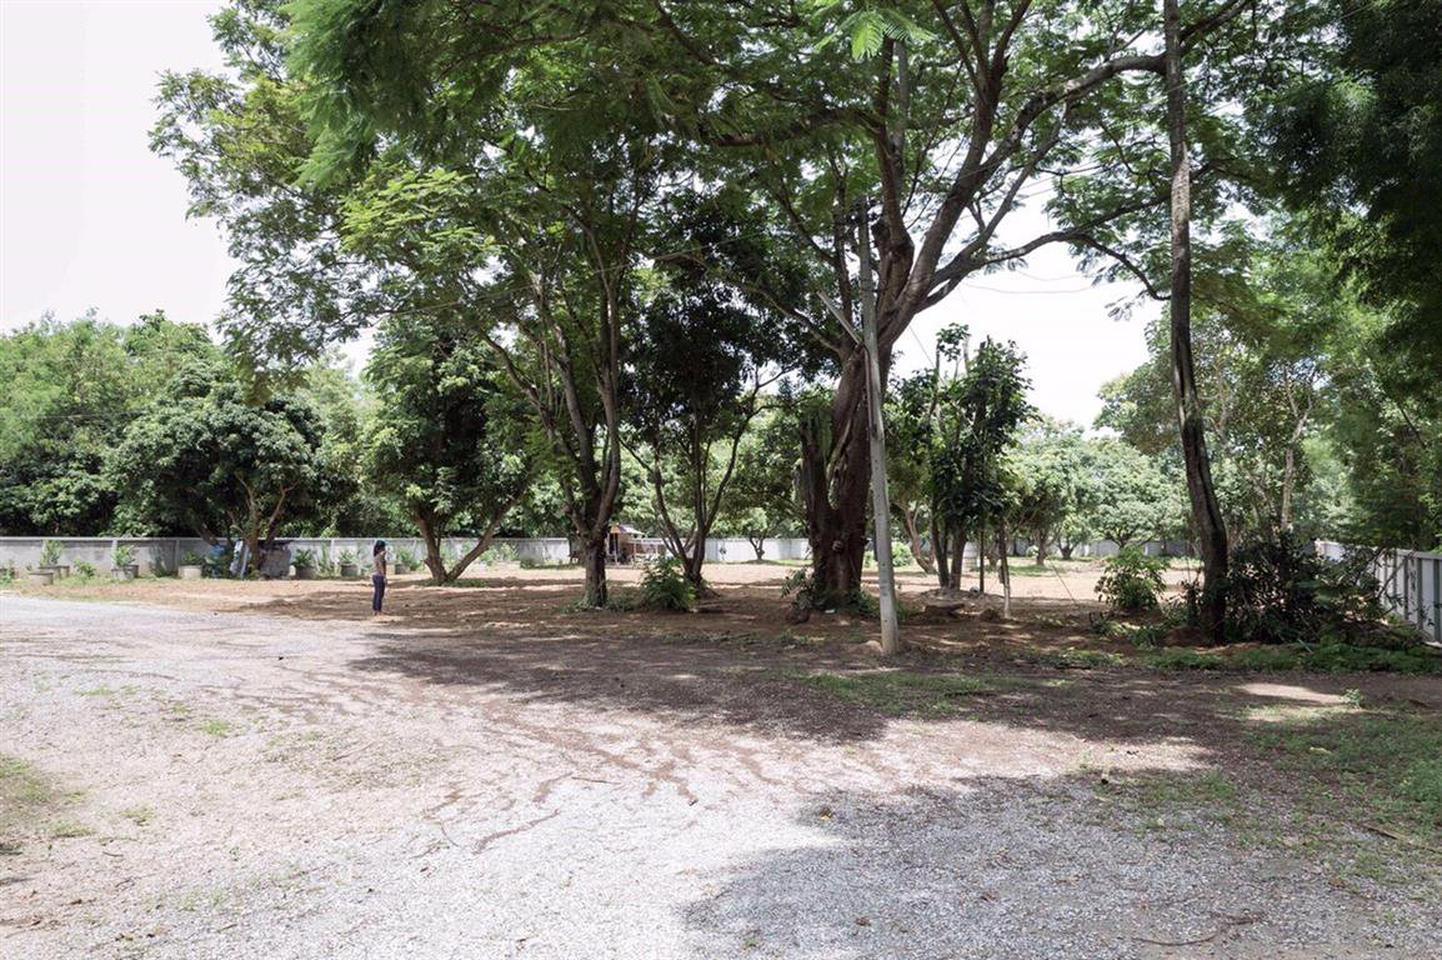 SRP01ขายที่สวนผลไม้2-2-05.7ไร่ติดทางสาธารณประโยชน์ที่เชื่อมก รูปที่ 5